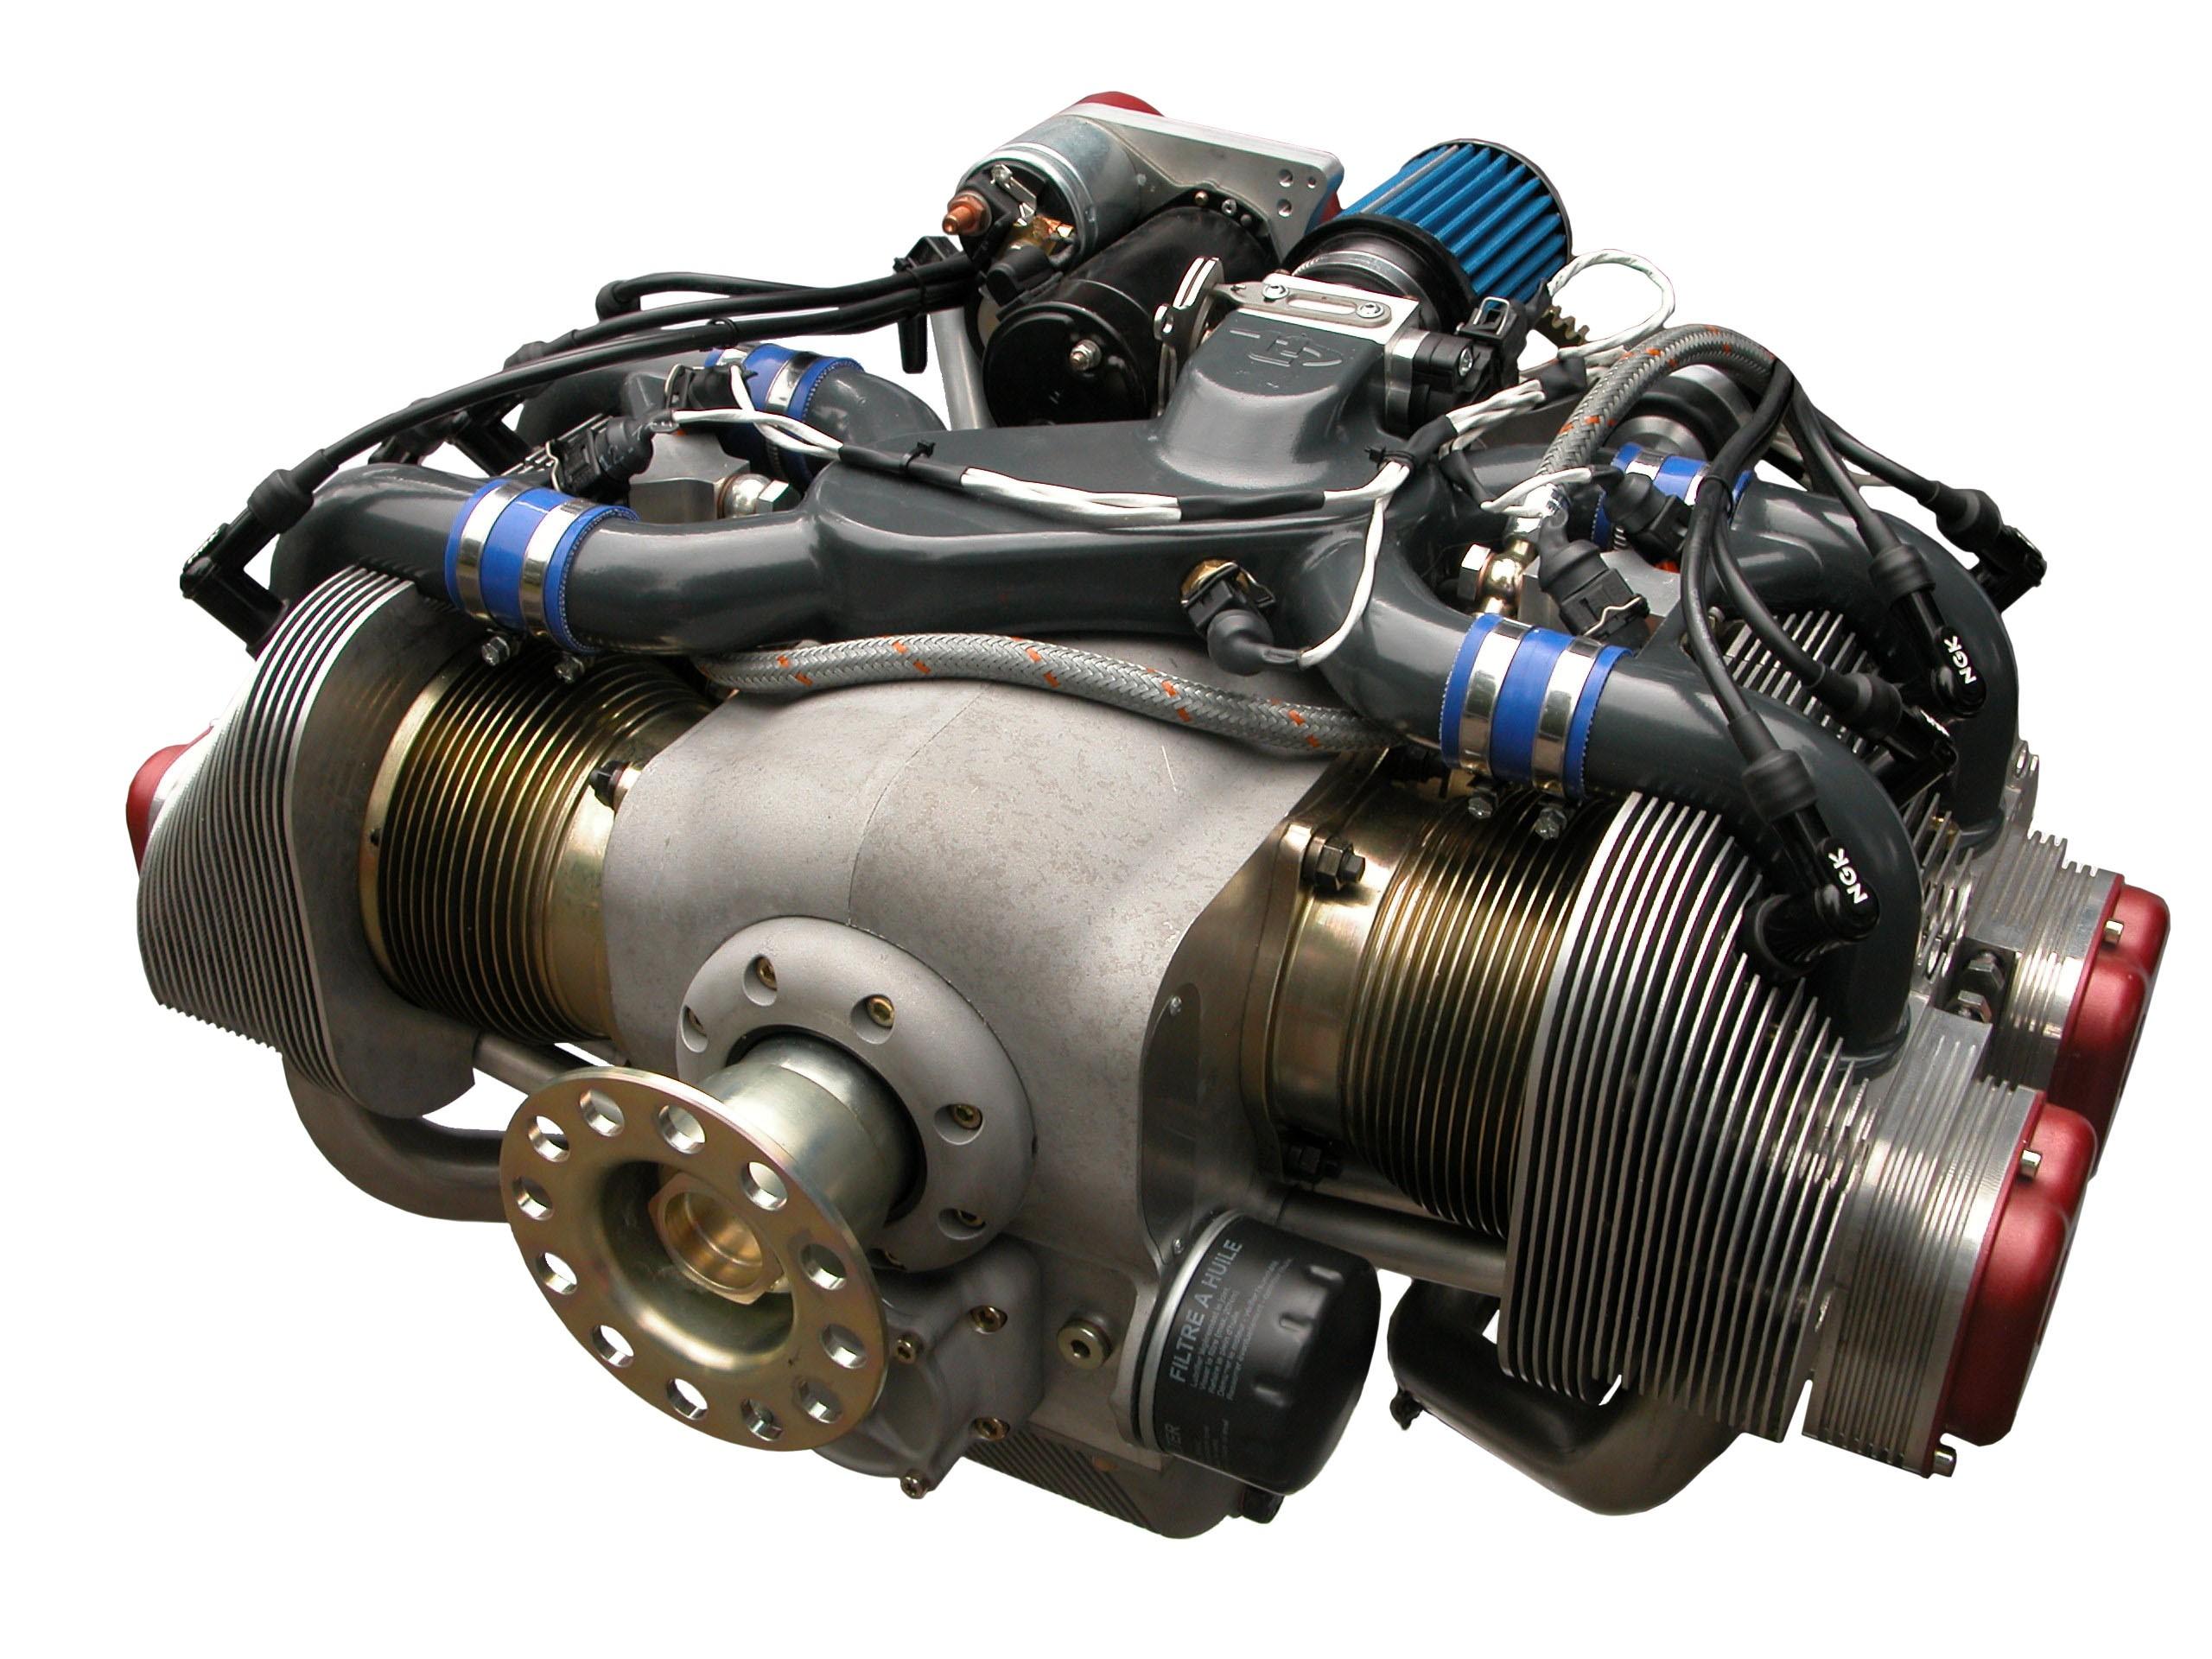 Subaru Boxer Engine Diagram   My Wiring DIagram